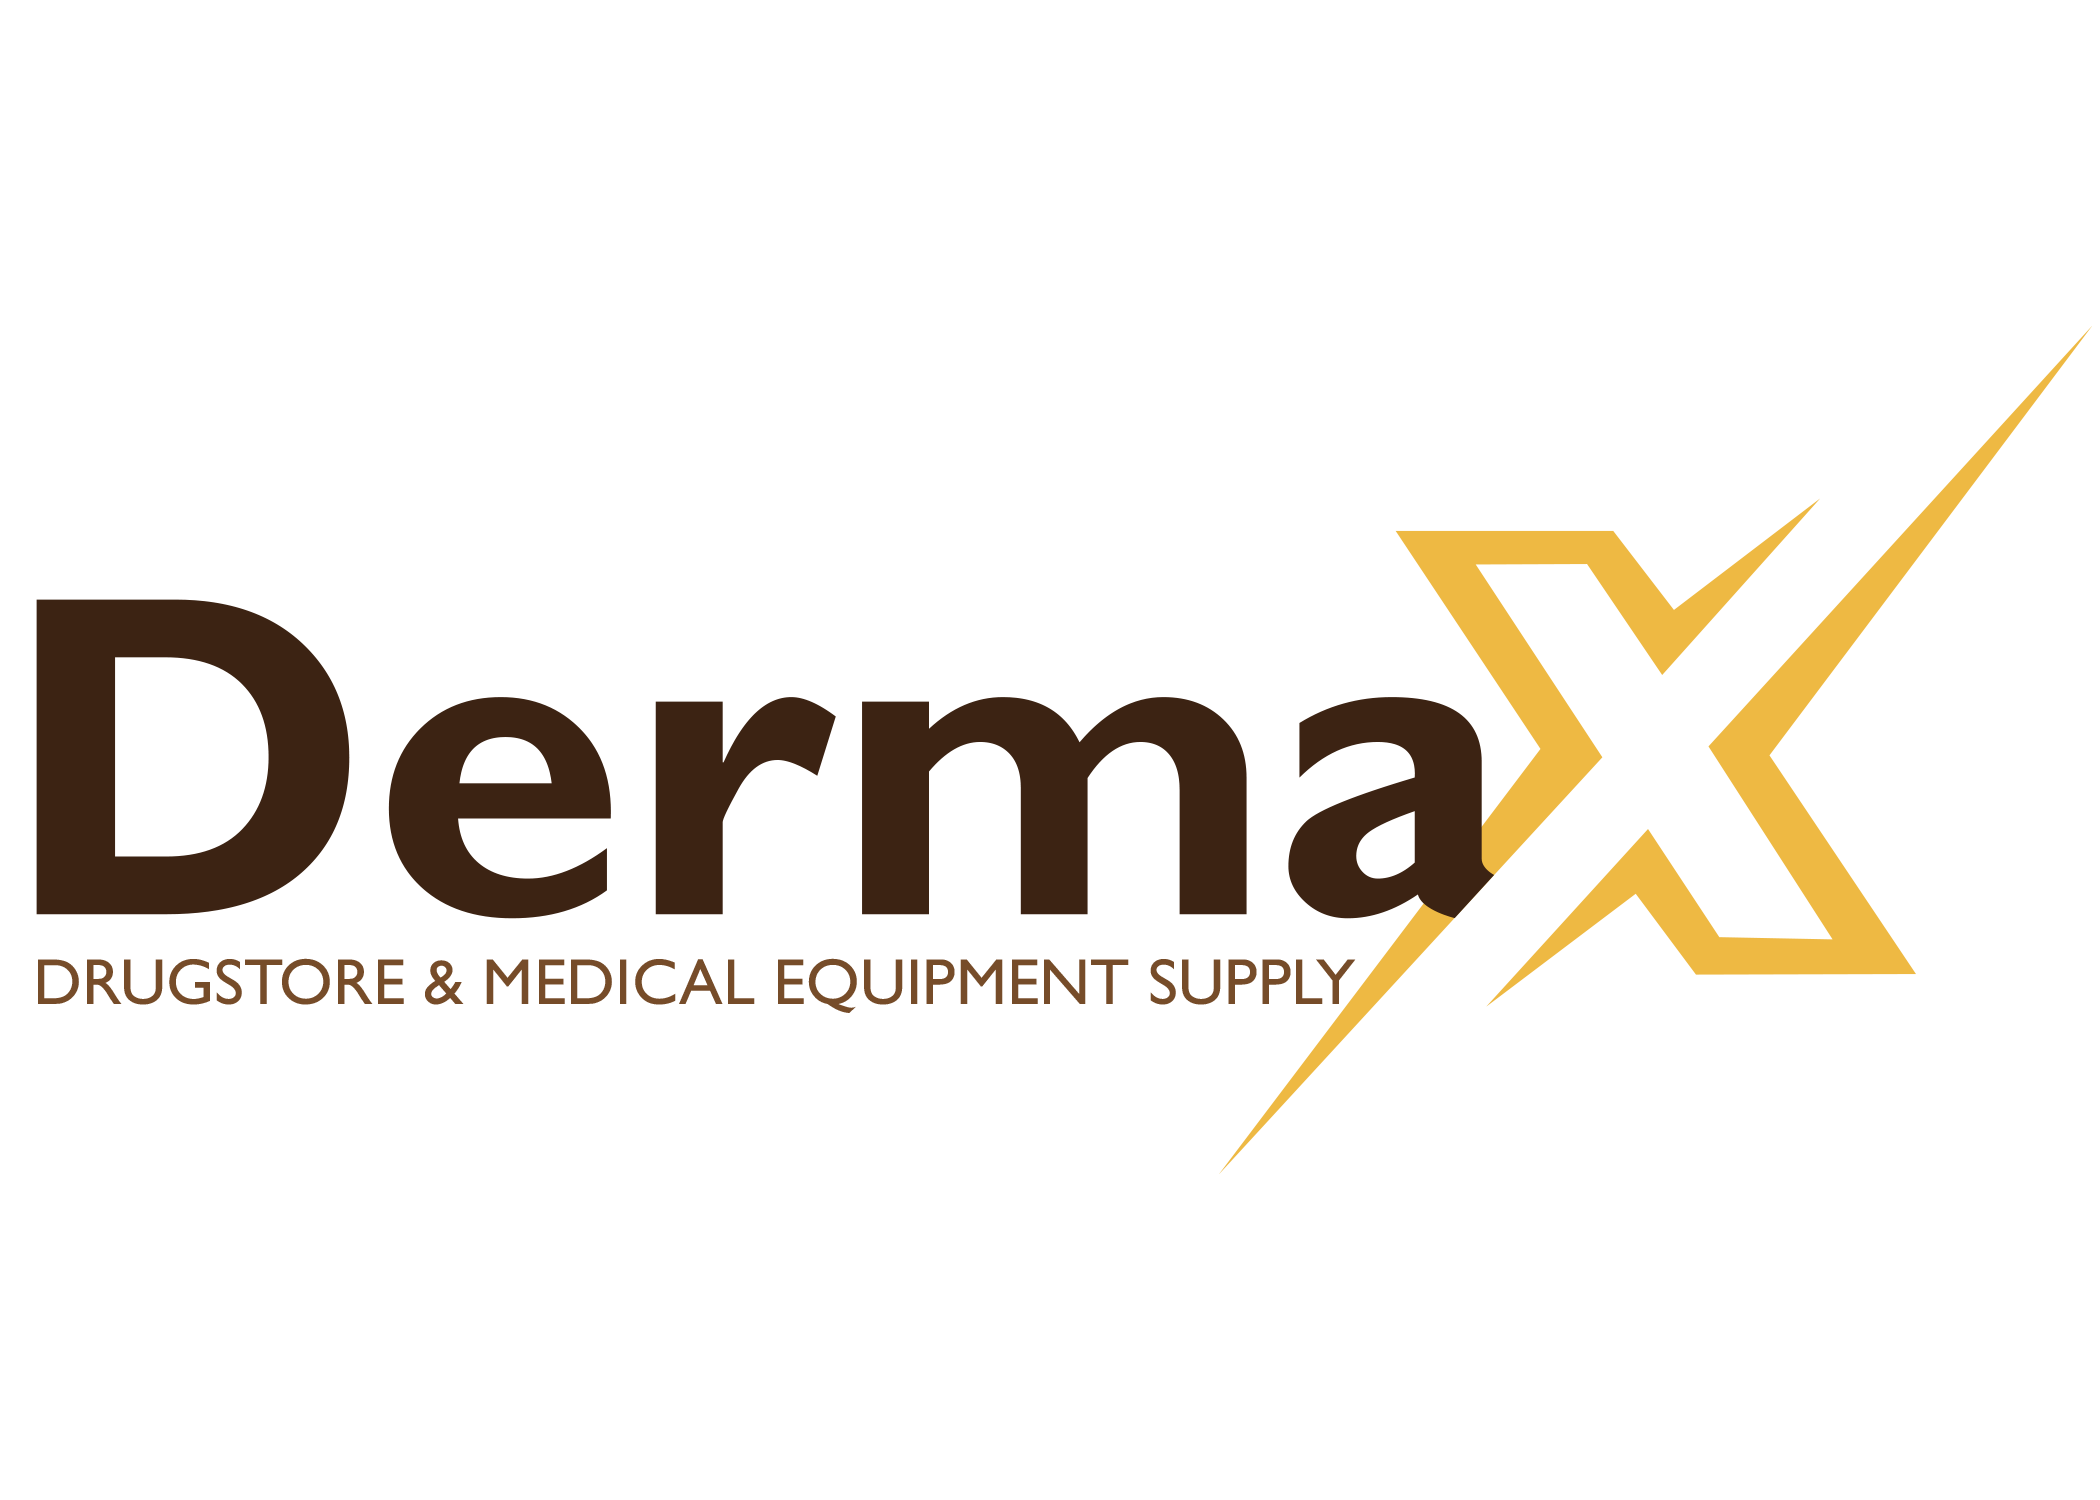 DermaX Drugstore & Medical Equipment Supply LLC